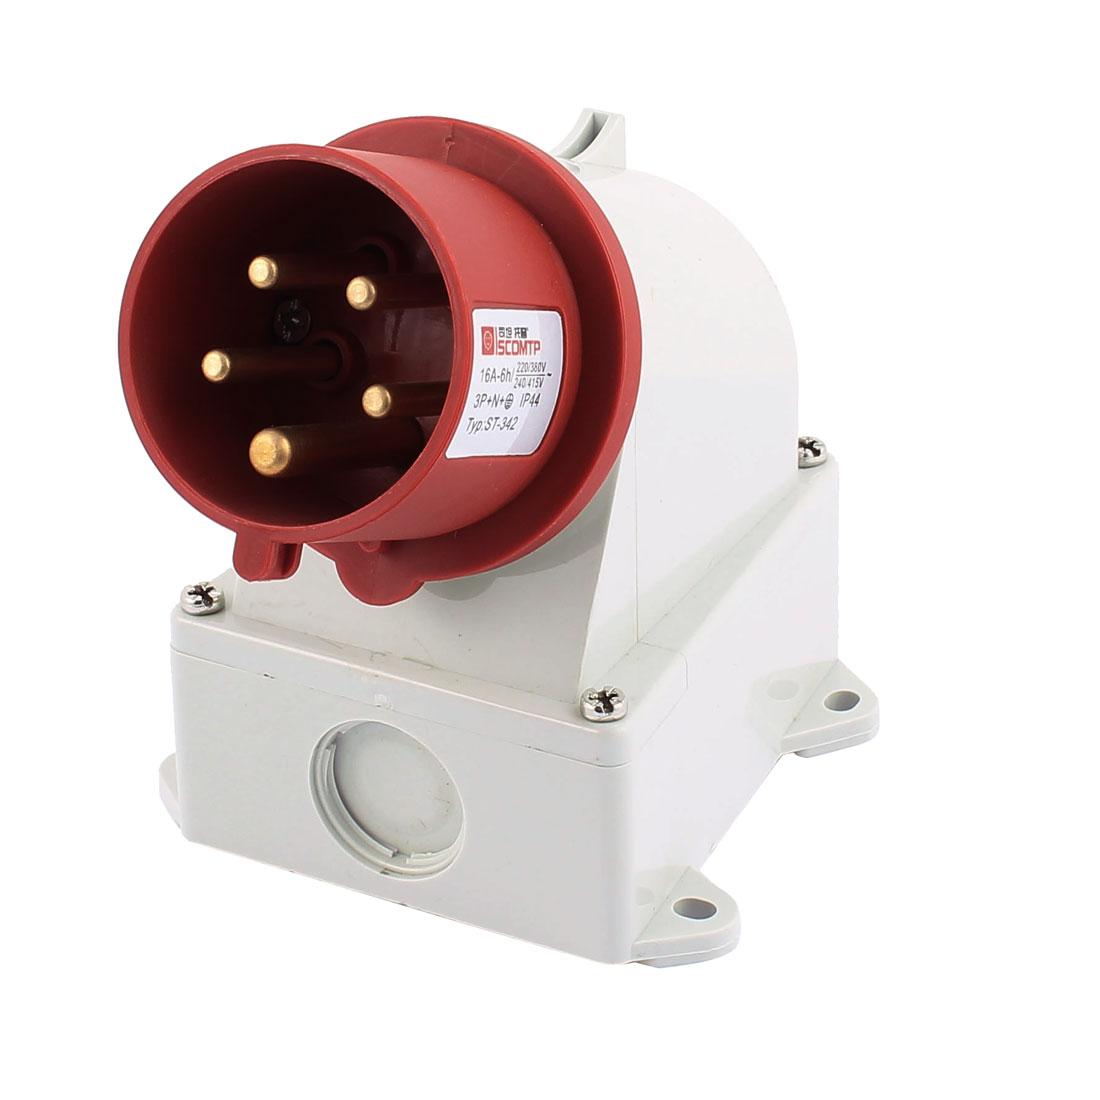 AC 240V-415V 16A IP44 3P+N+E 5-Terminal Male Industrial Caravan Plug